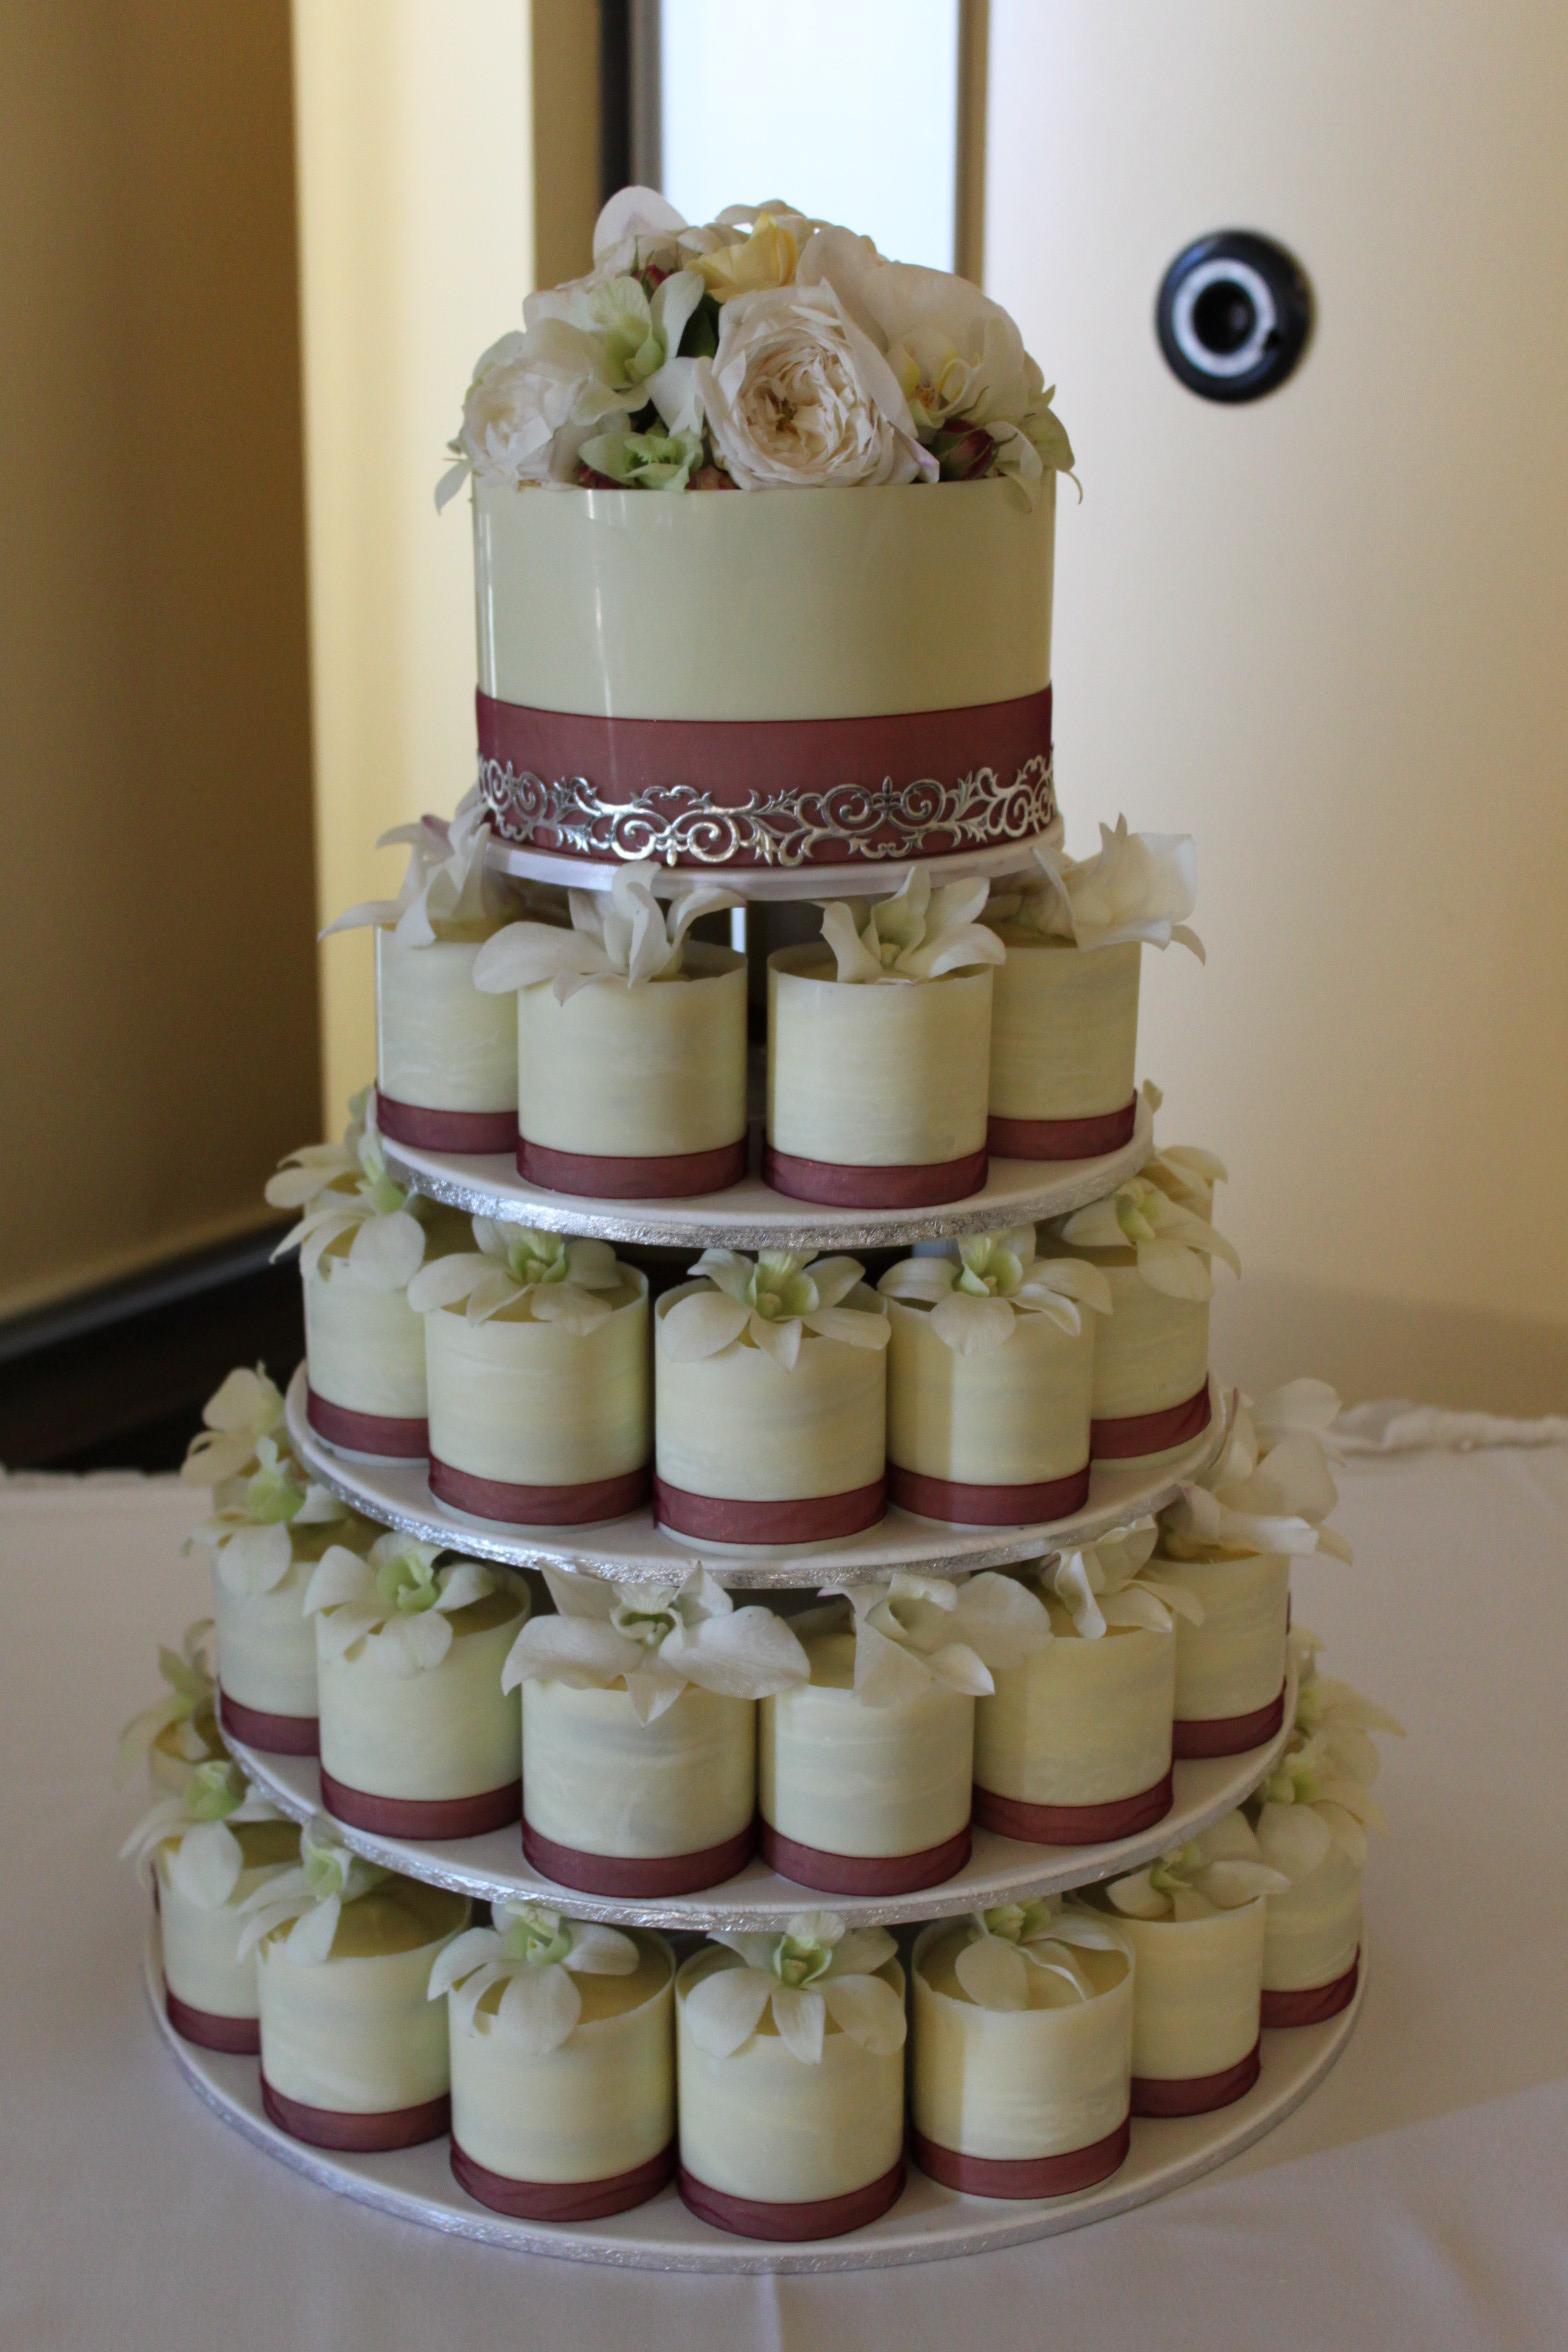 Cake Feature 3.jpg